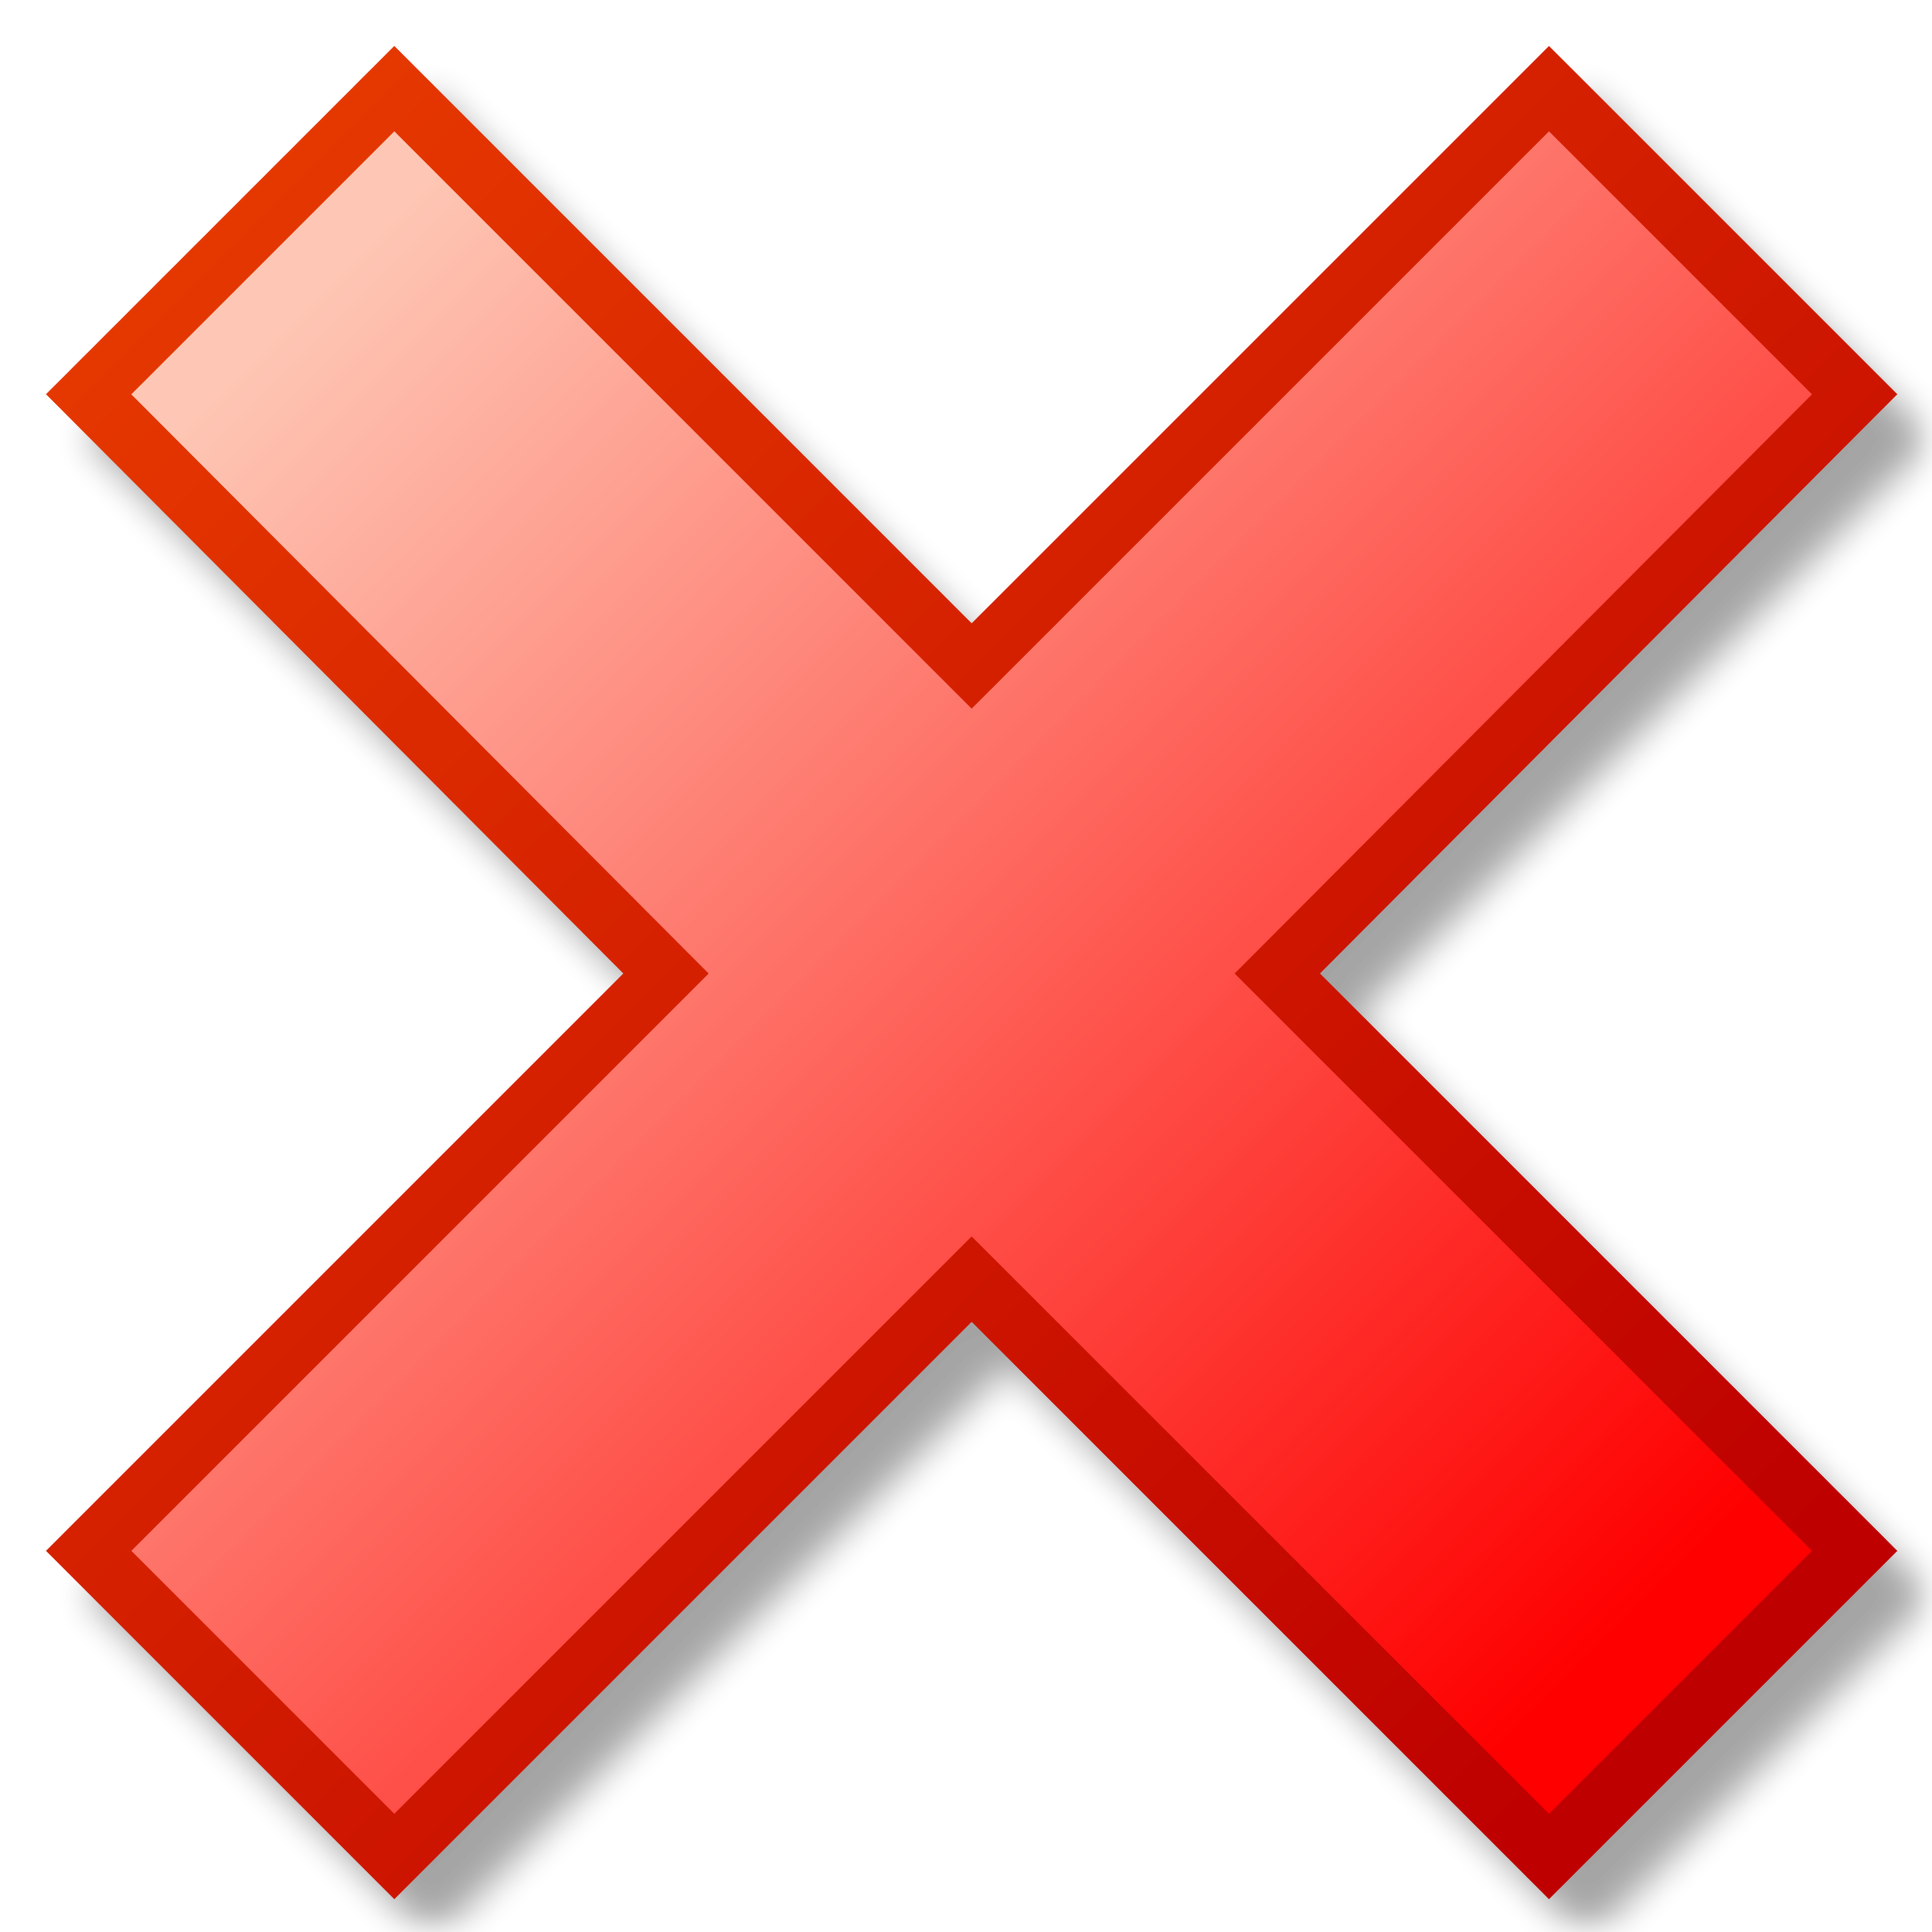 Download Free Cancel Button Photos ICON favicon.